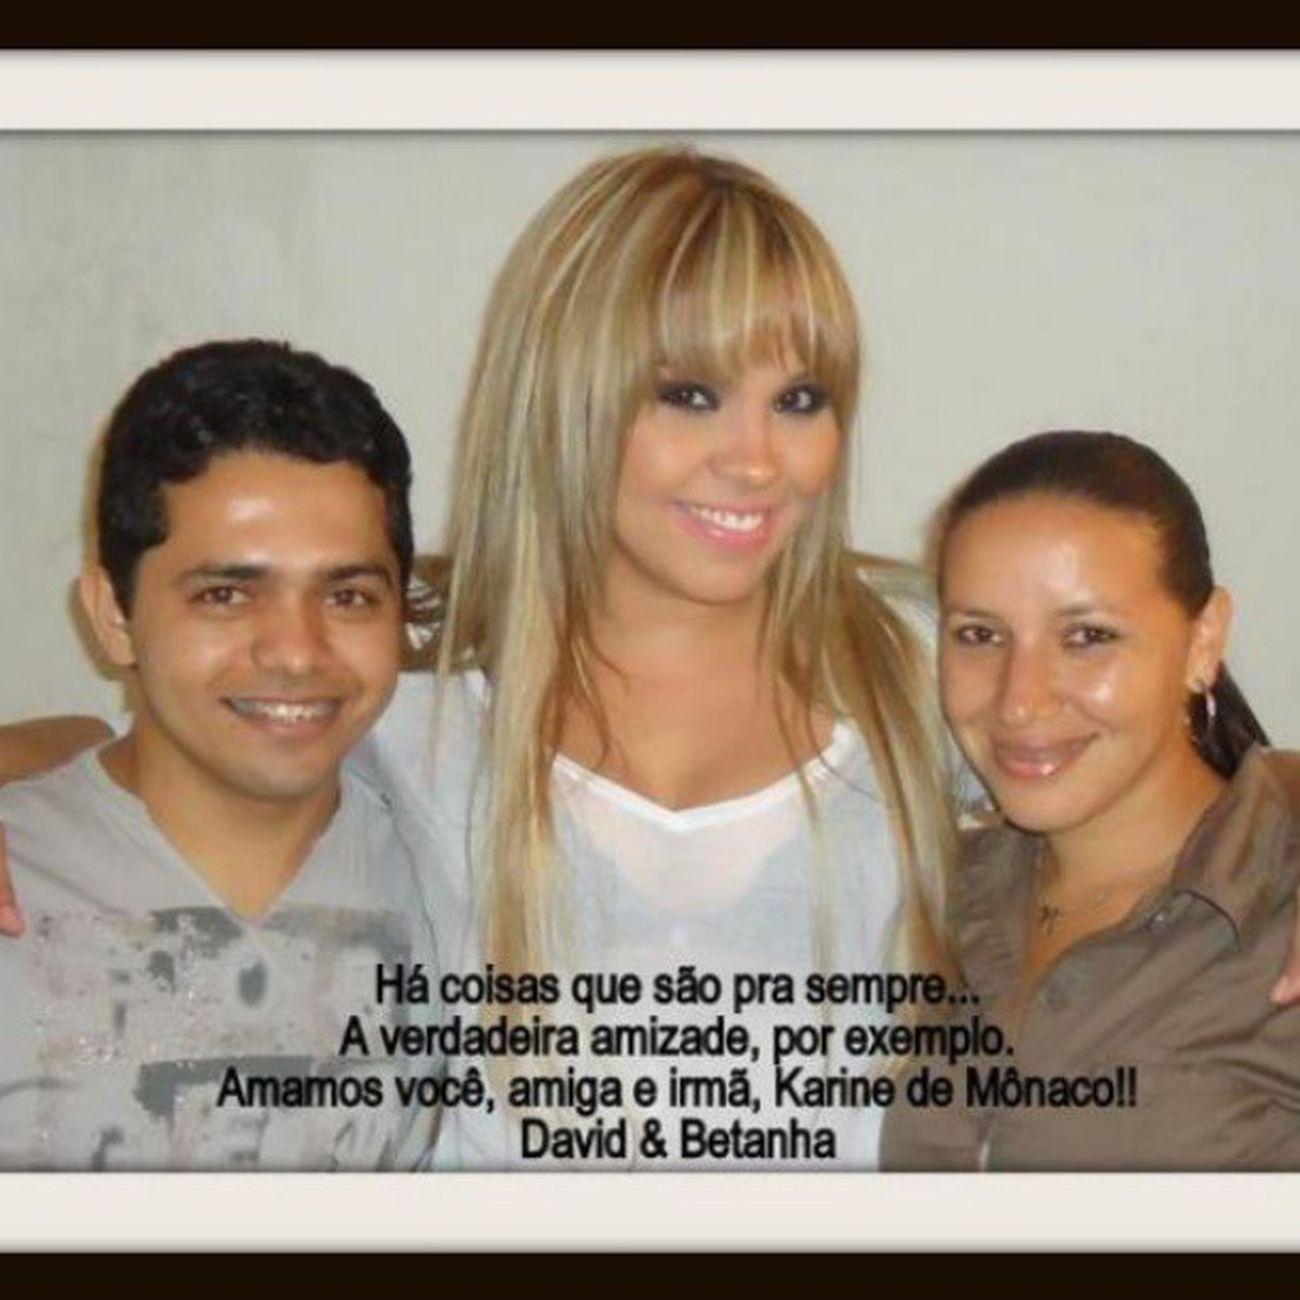 Gosto muuuuito... @karinedmonaco BetanhaAlves